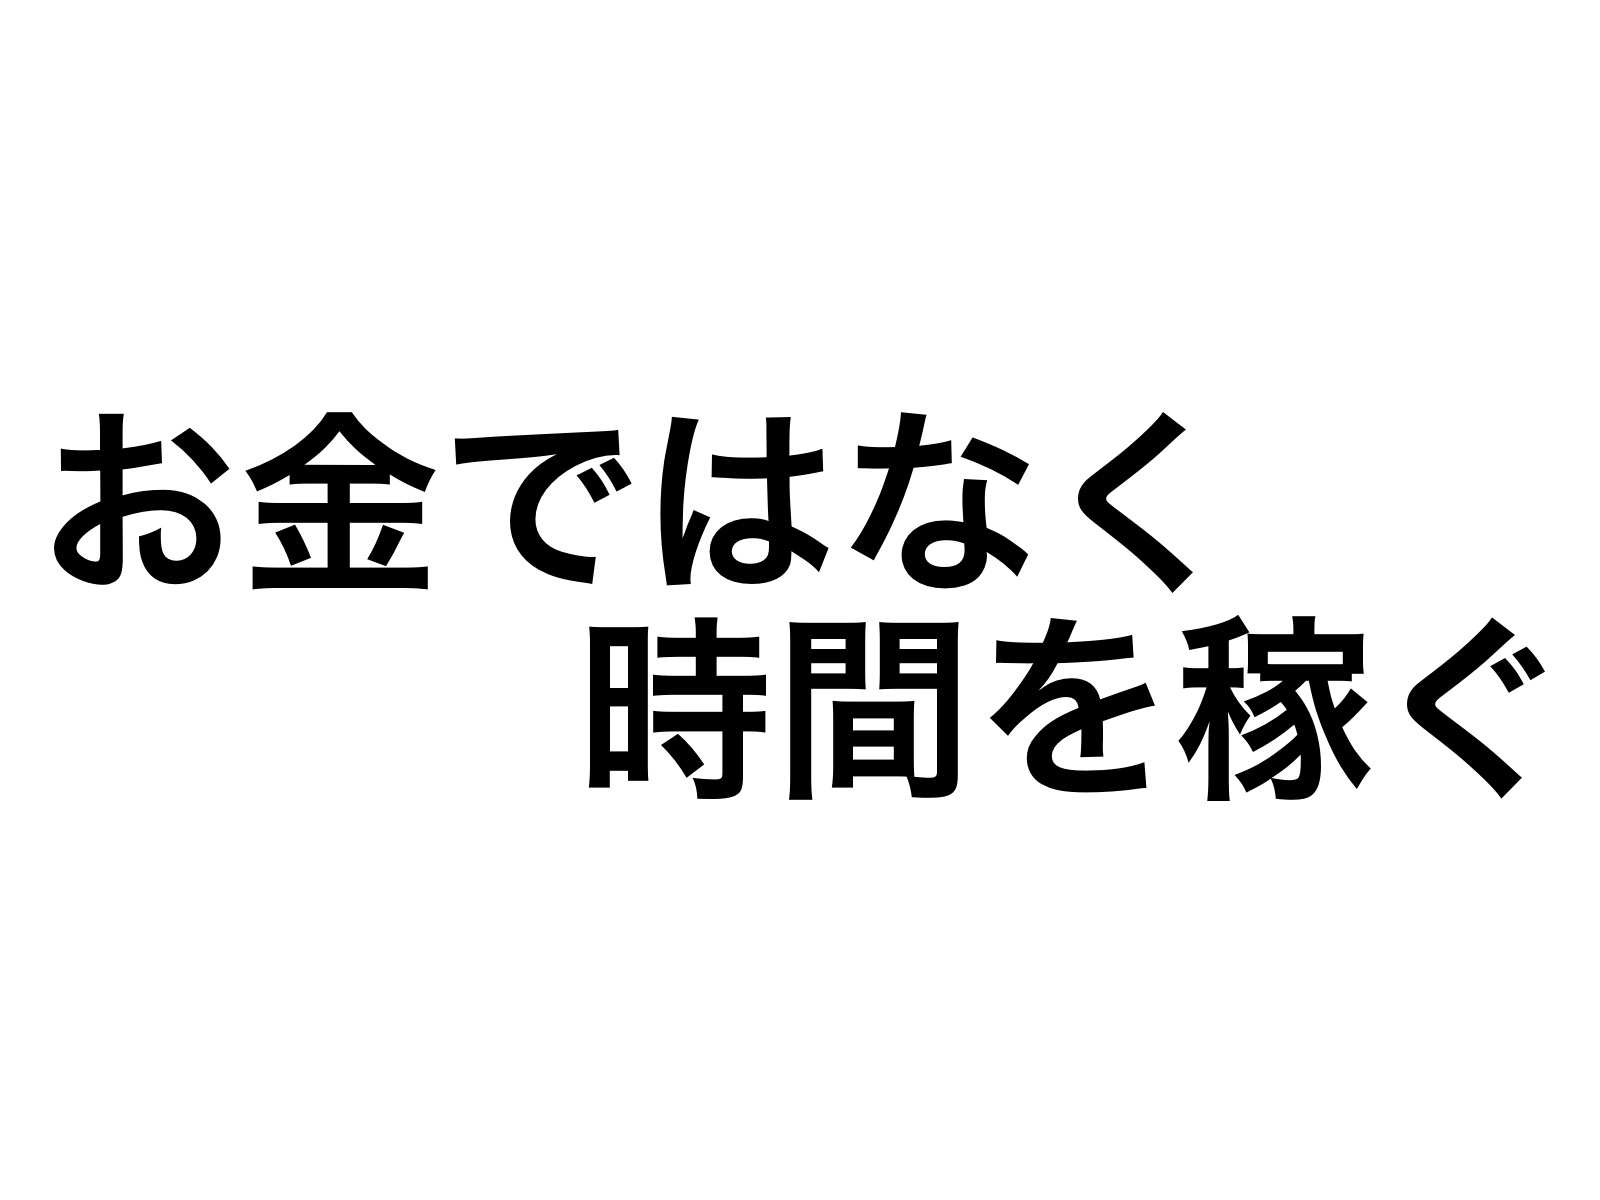 2016 07 31 09 27 16